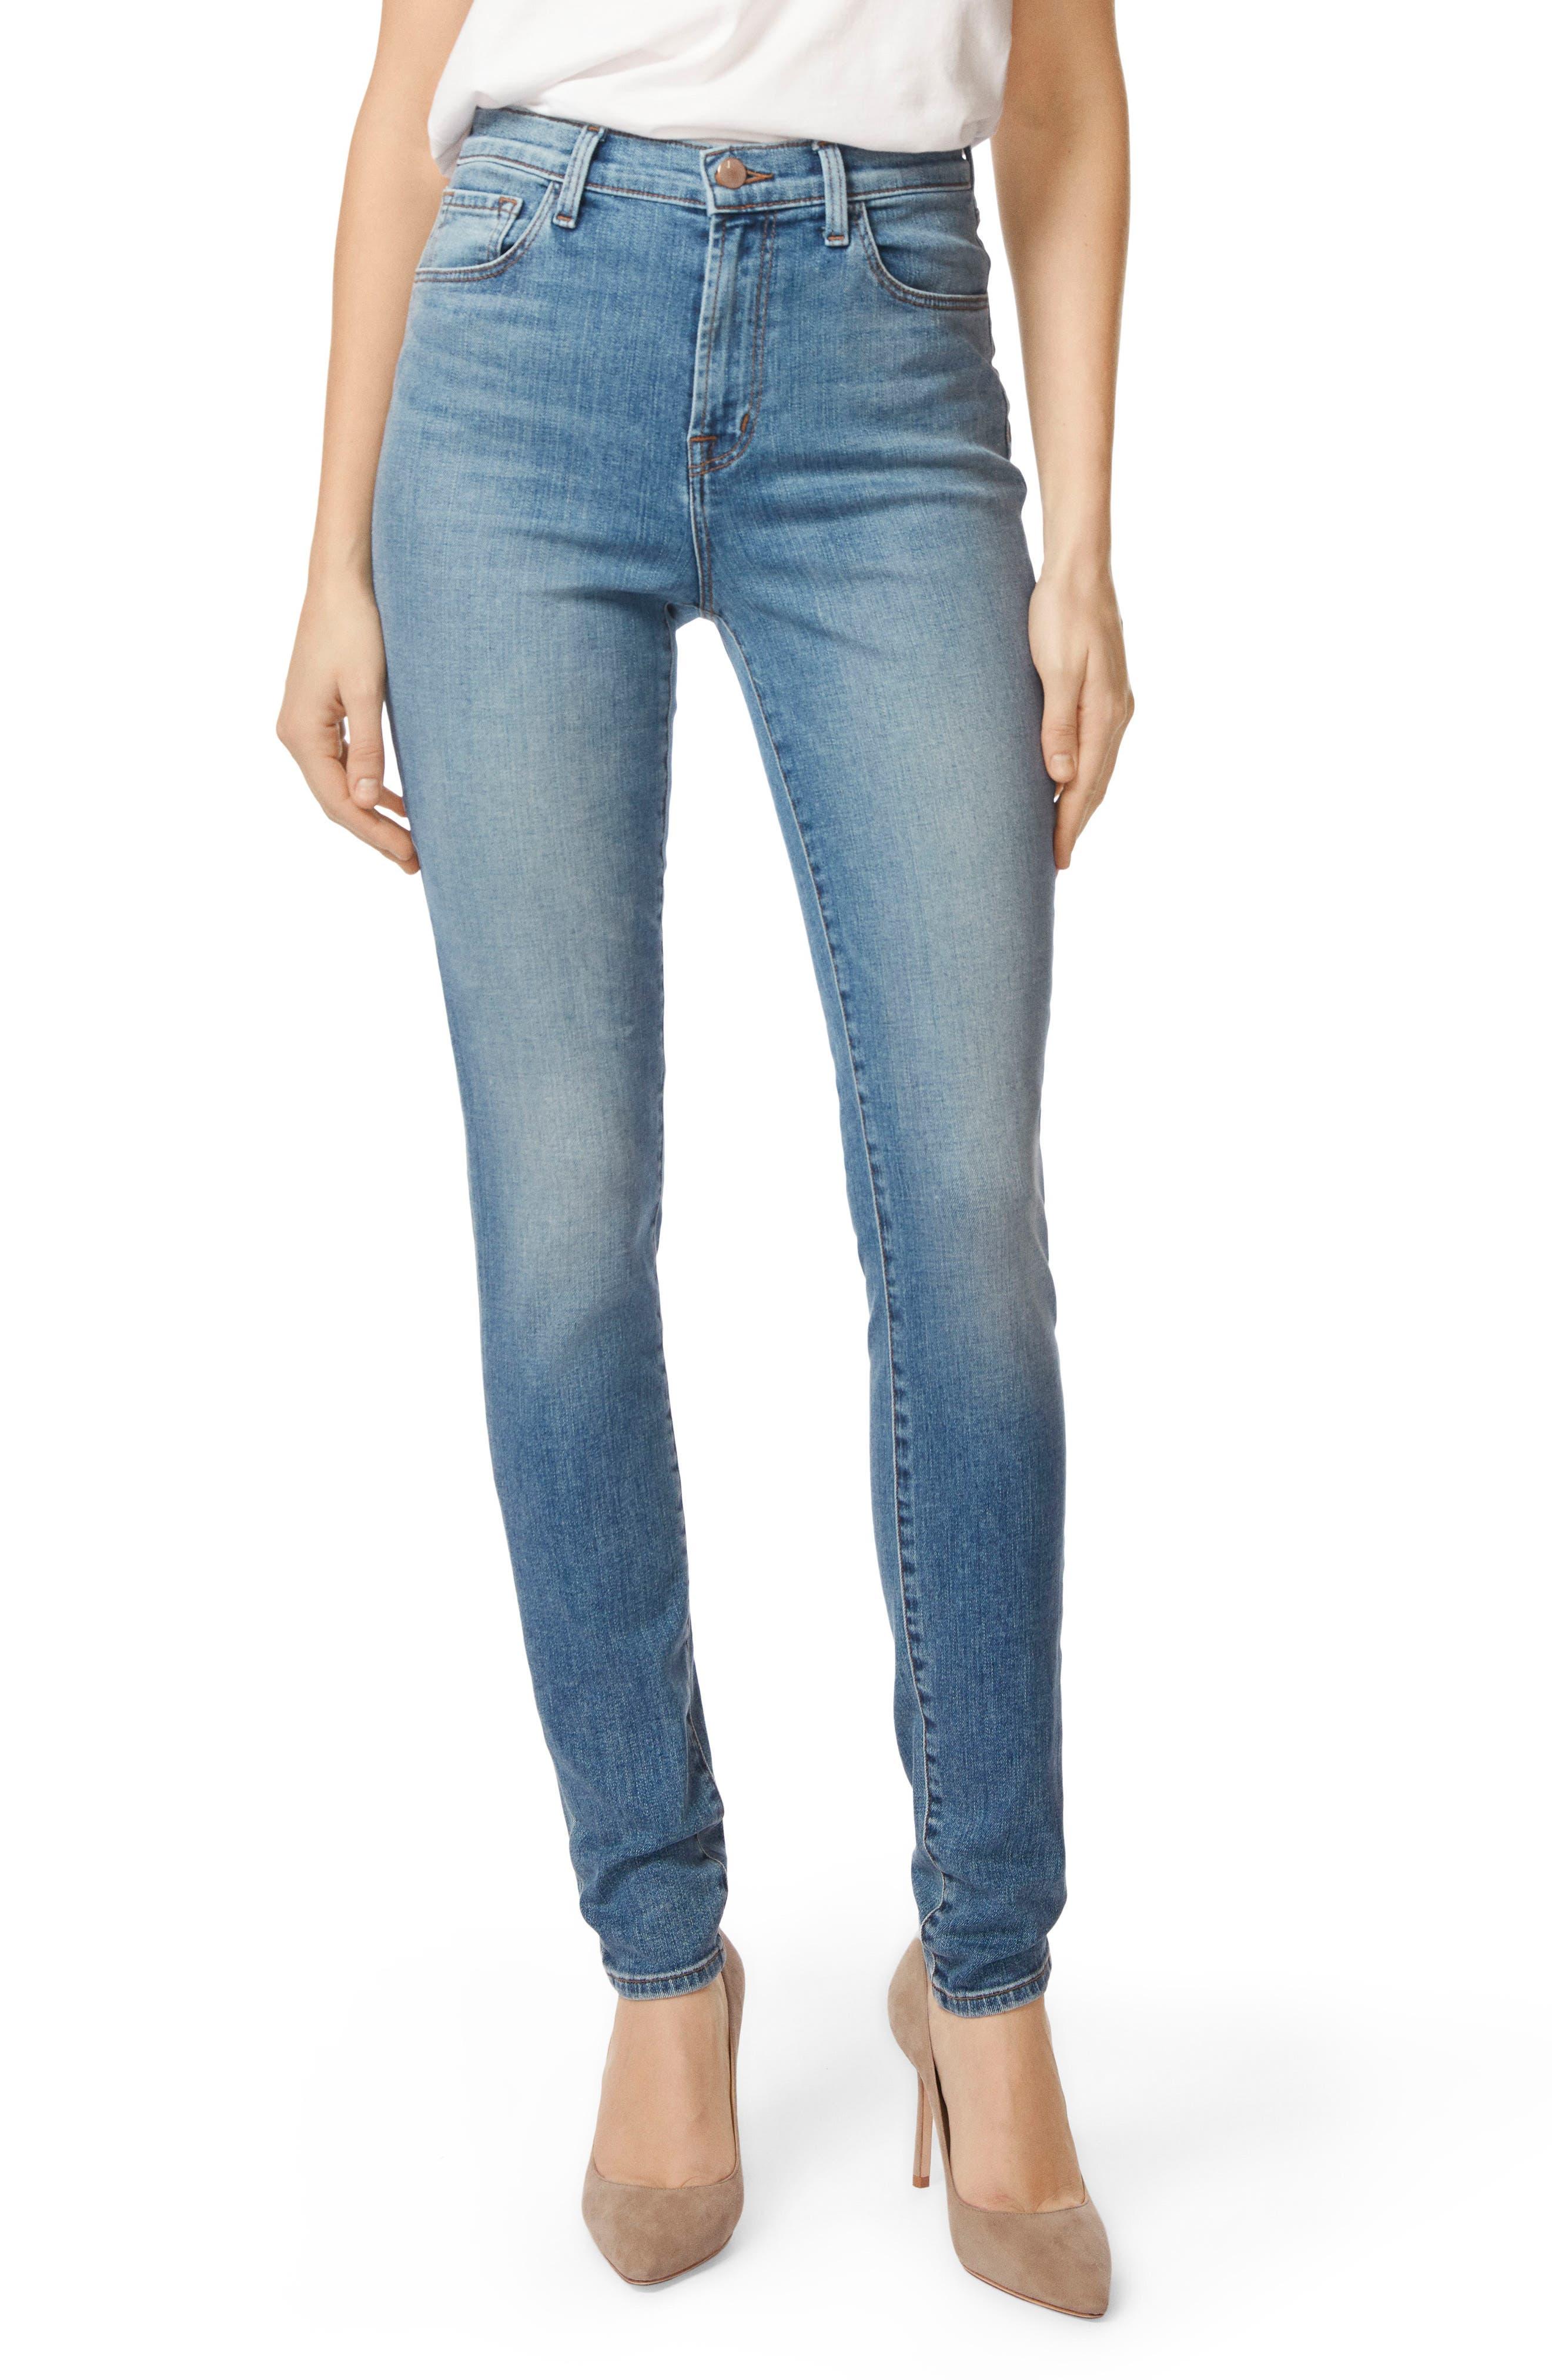 Carolina Super High Waist Skinny Jeans,                             Main thumbnail 1, color,                             400